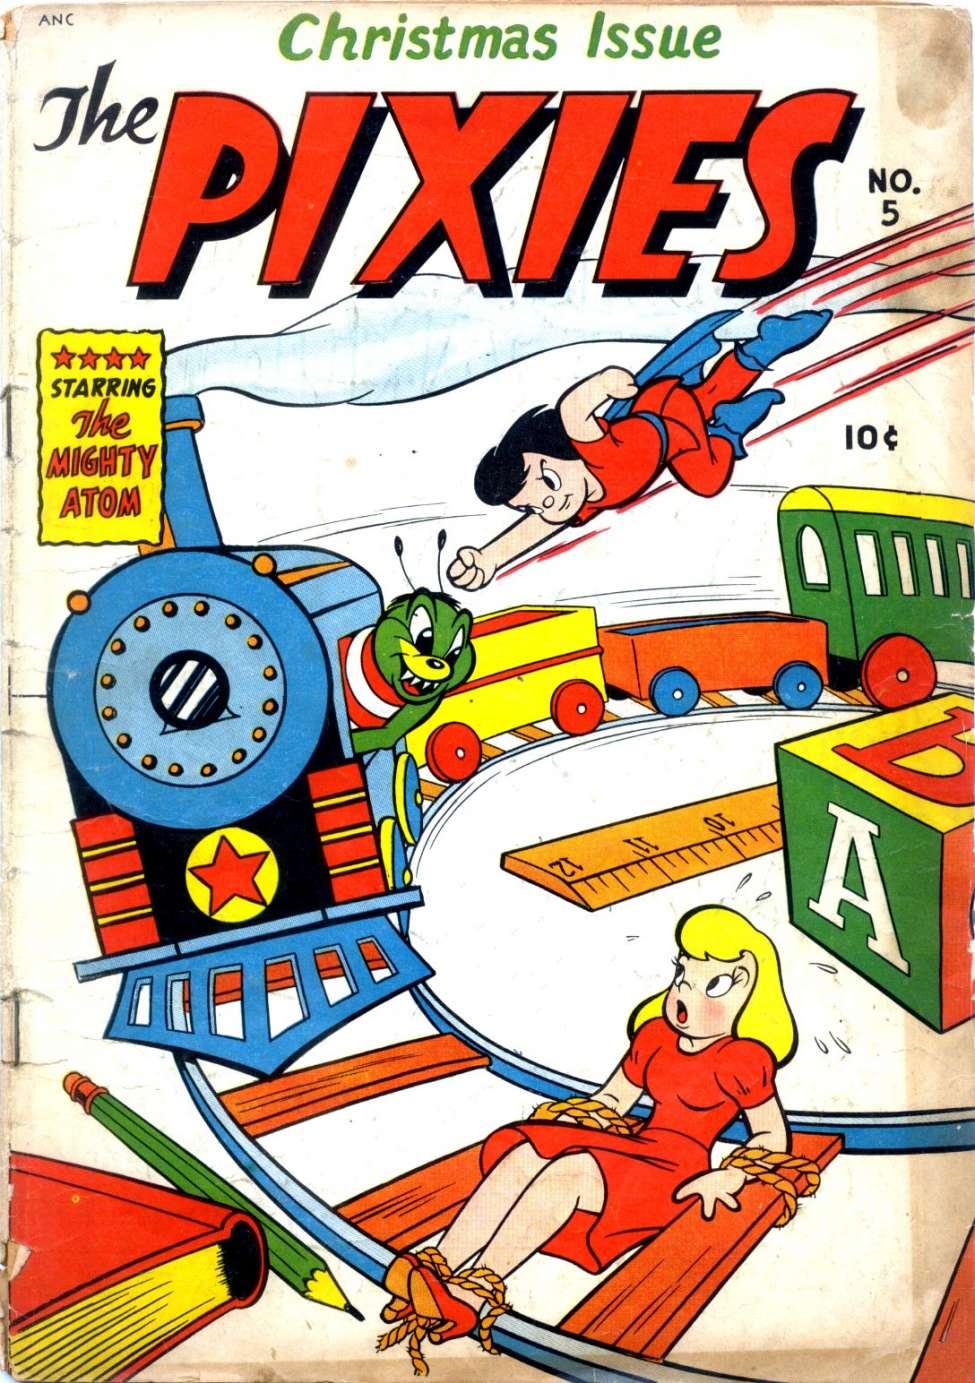 The Pixies #5, Magazine Enterprises